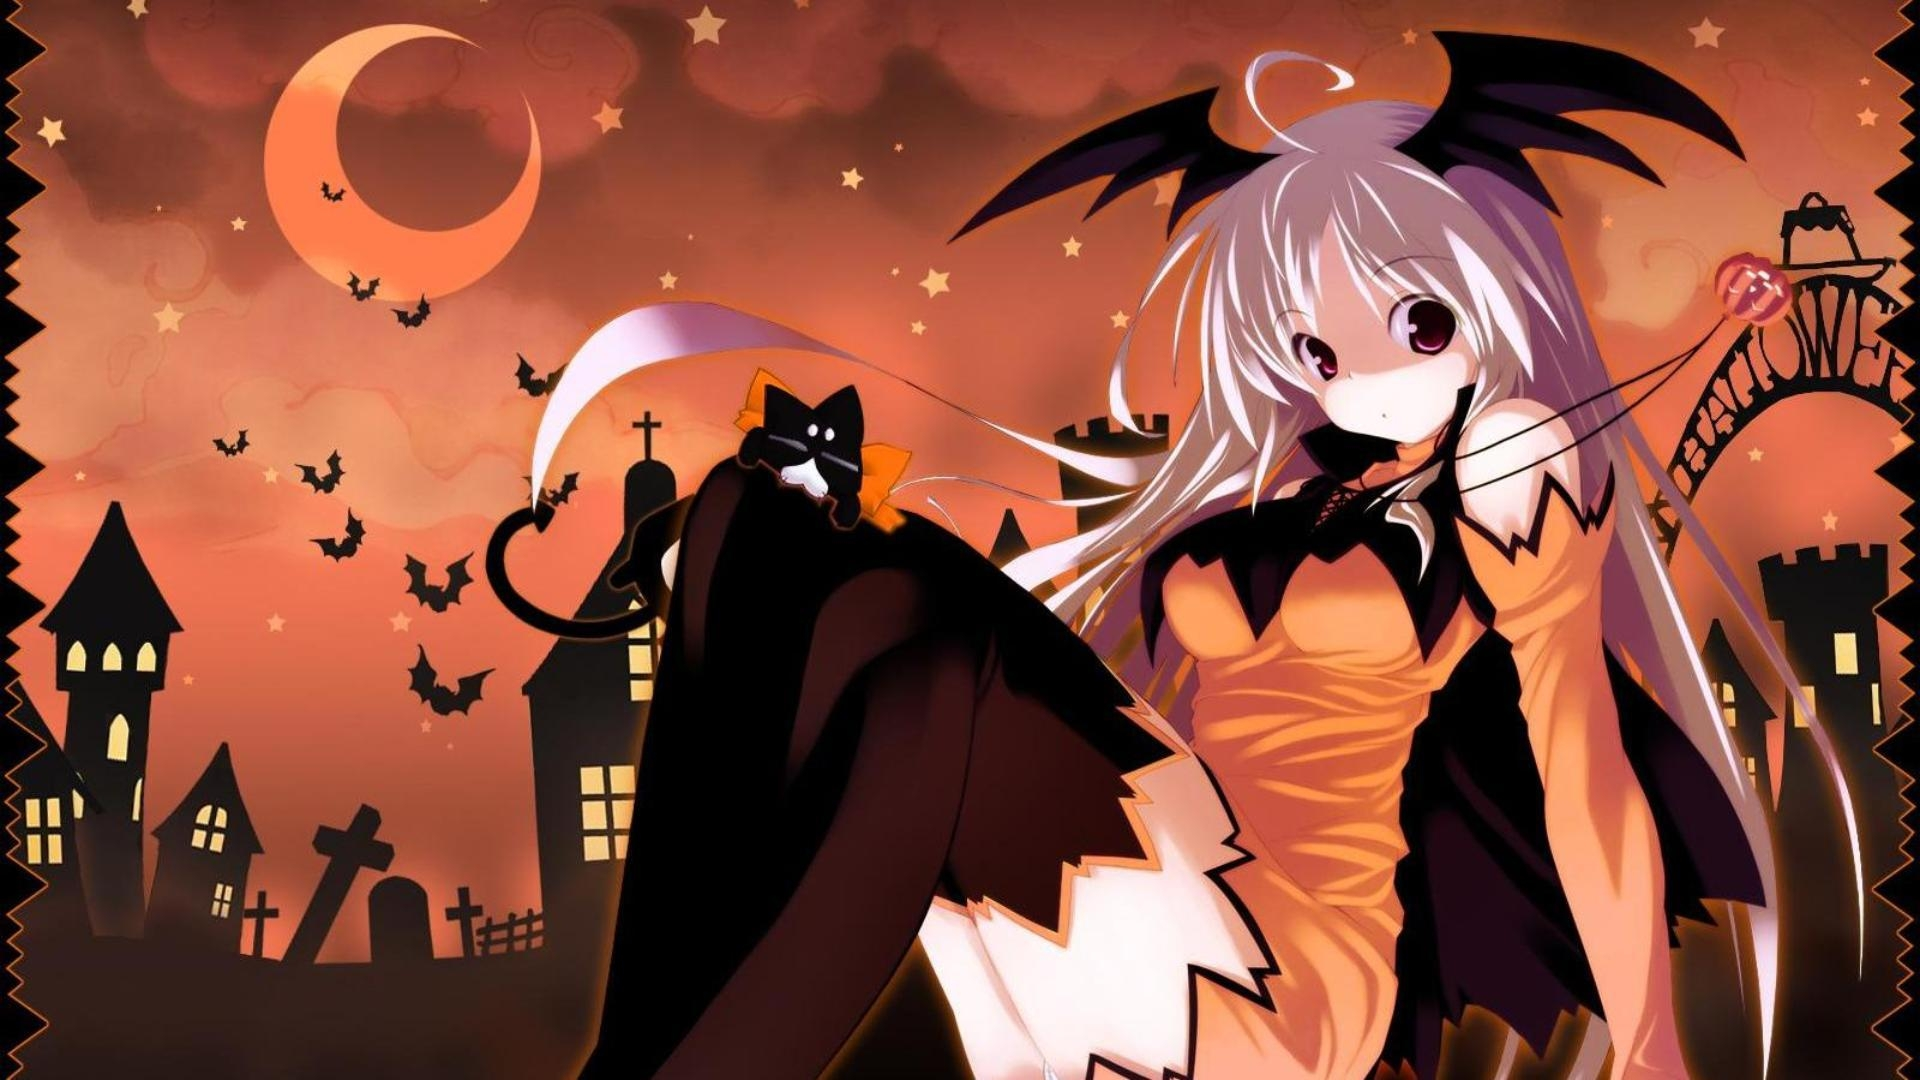 Do You Have An Anime Wallpaper Phone Pc  Forums Myanimelist Net